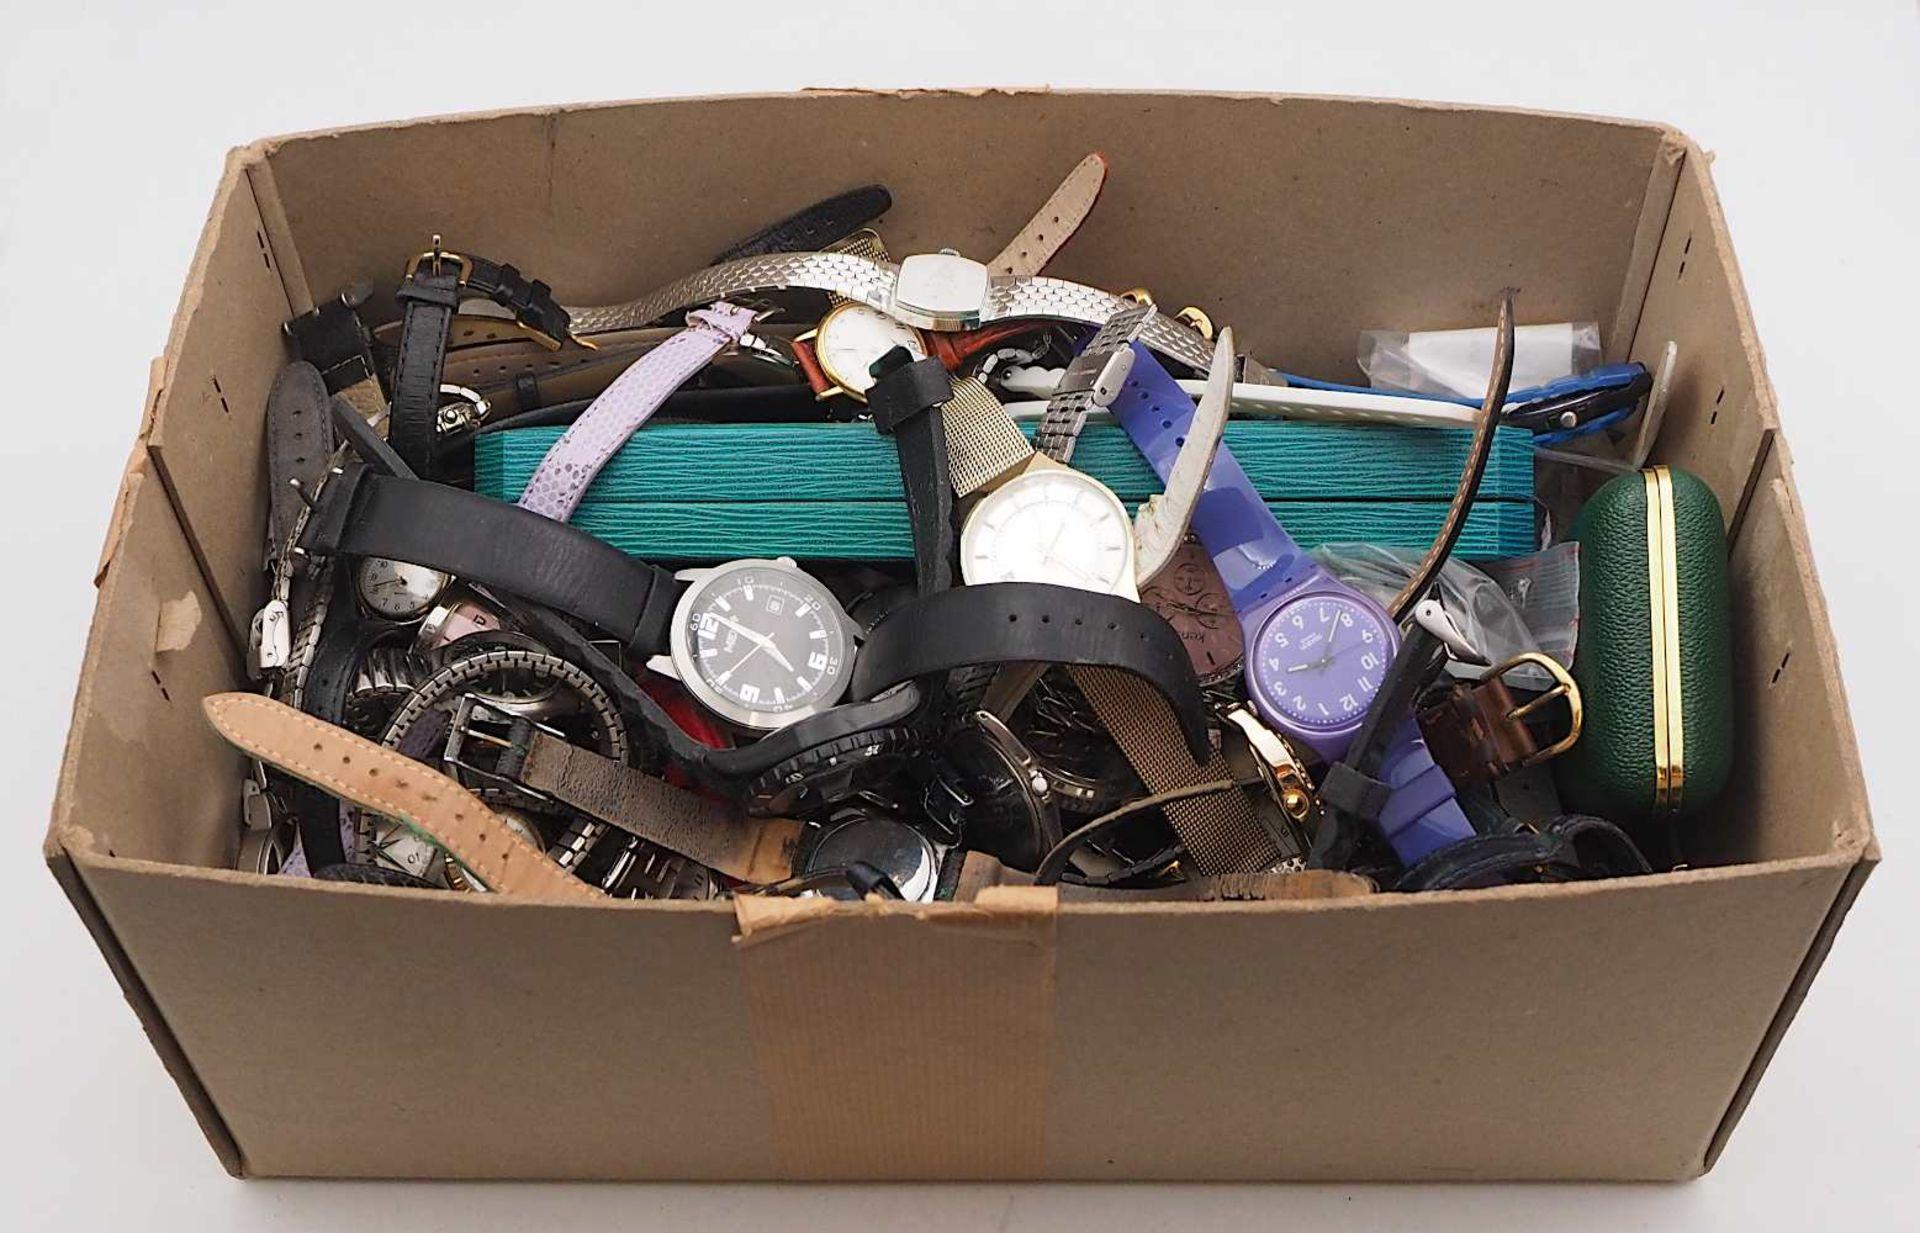 1 Konv. Armbanduhren Metall z.T. verg. Kunststoff u.a. Tsp./besch. im Karton - Bild 2 aus 2